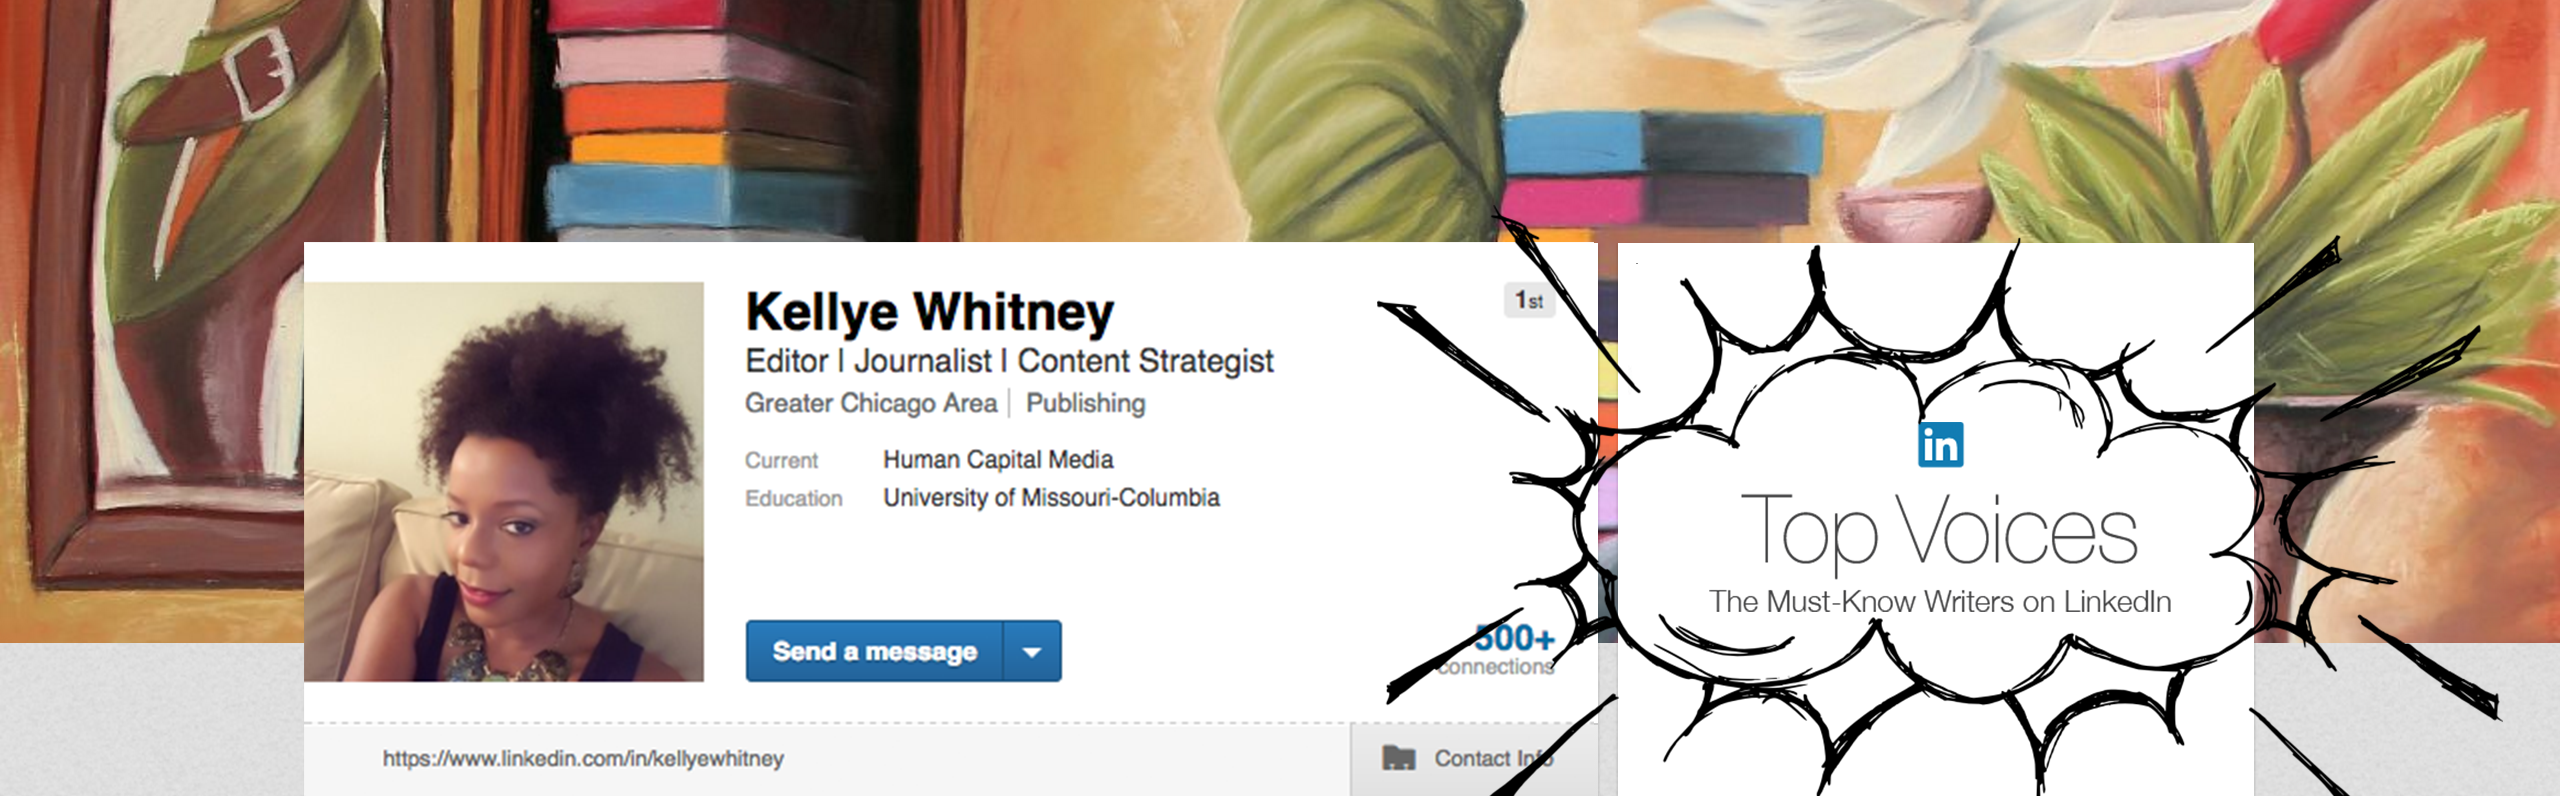 K Whitney LinkedIn Top Voices 2016